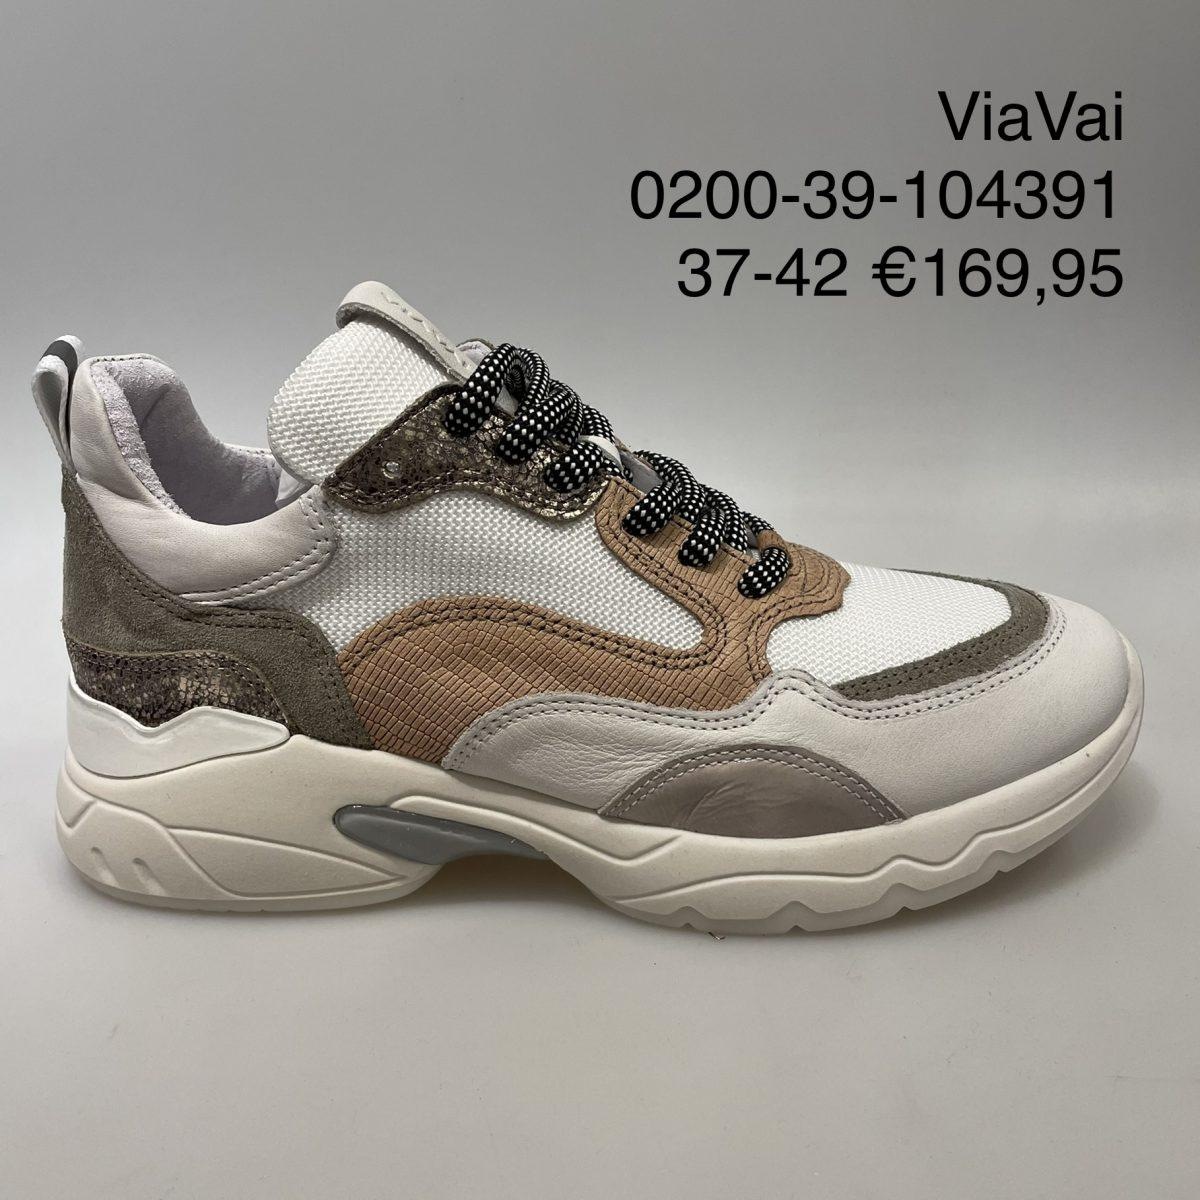 Dames Schoenen 2